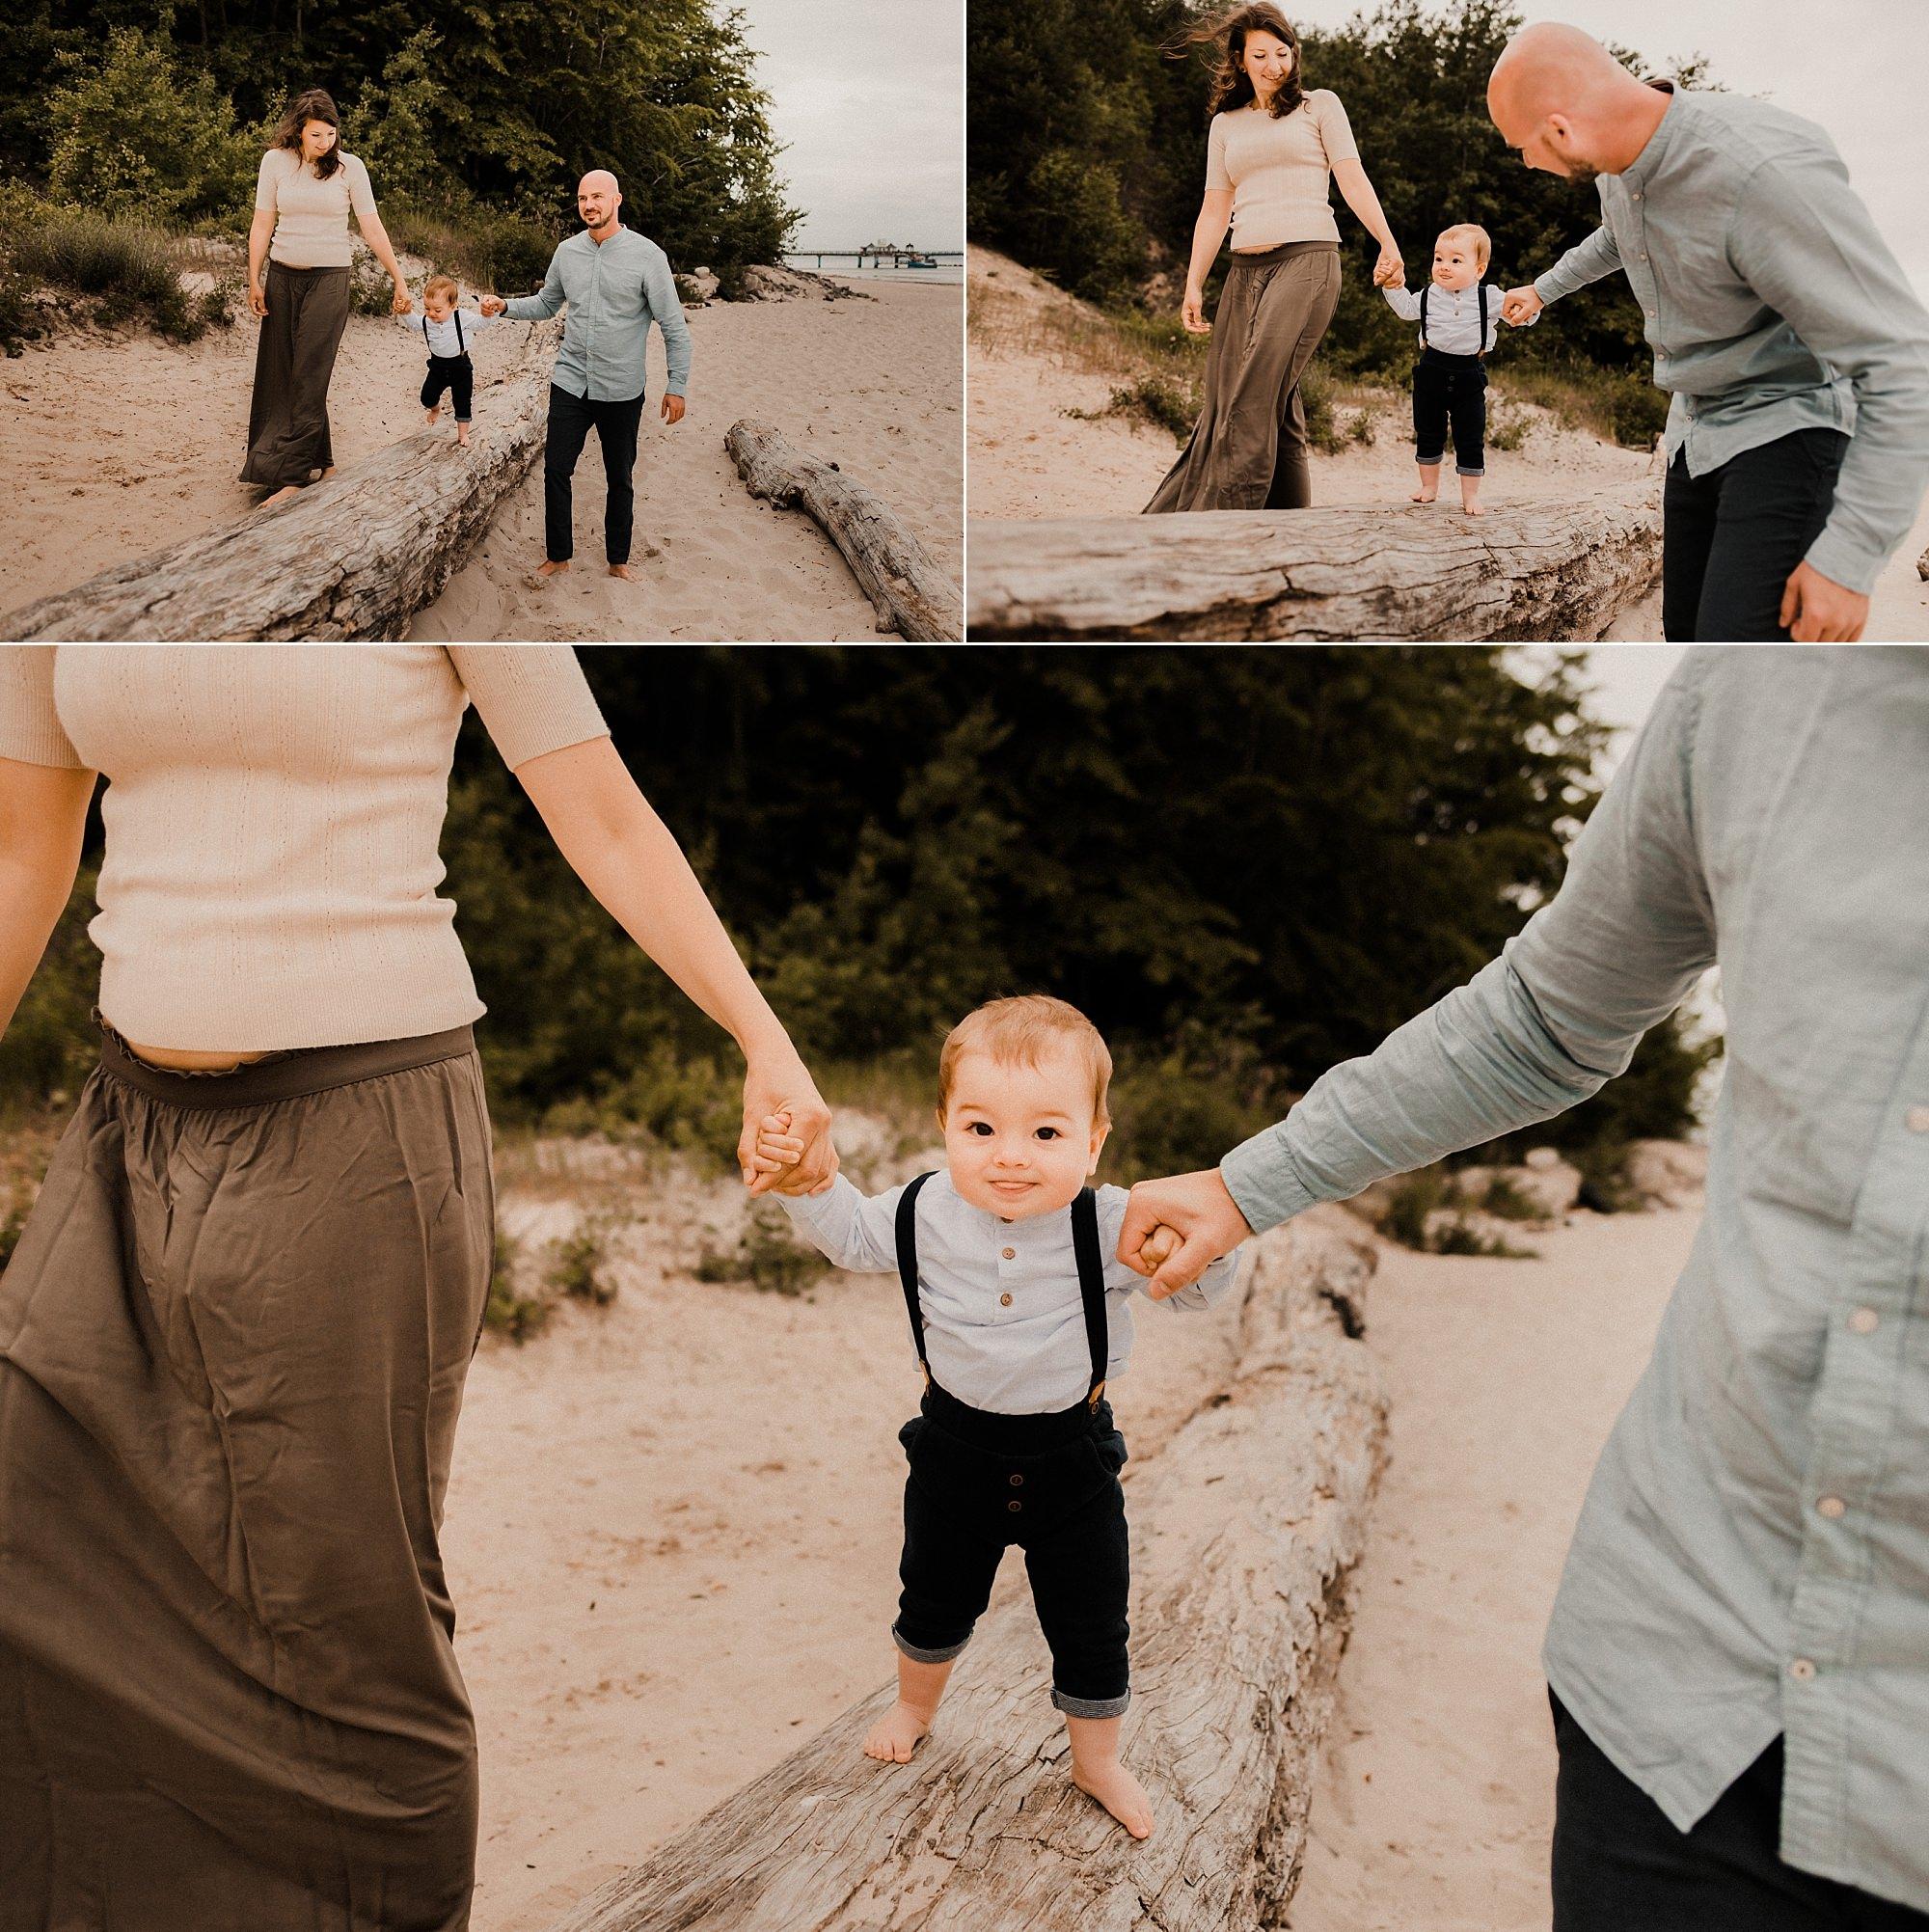 Familienfotograf - Rügen - Familienshooting - Sellin - Selliner Fotograf - Babyfotografie - Babyshooting - Binz - Strand - Ostseeurlaub - Fotoshooting - Natur - Insel Rügen